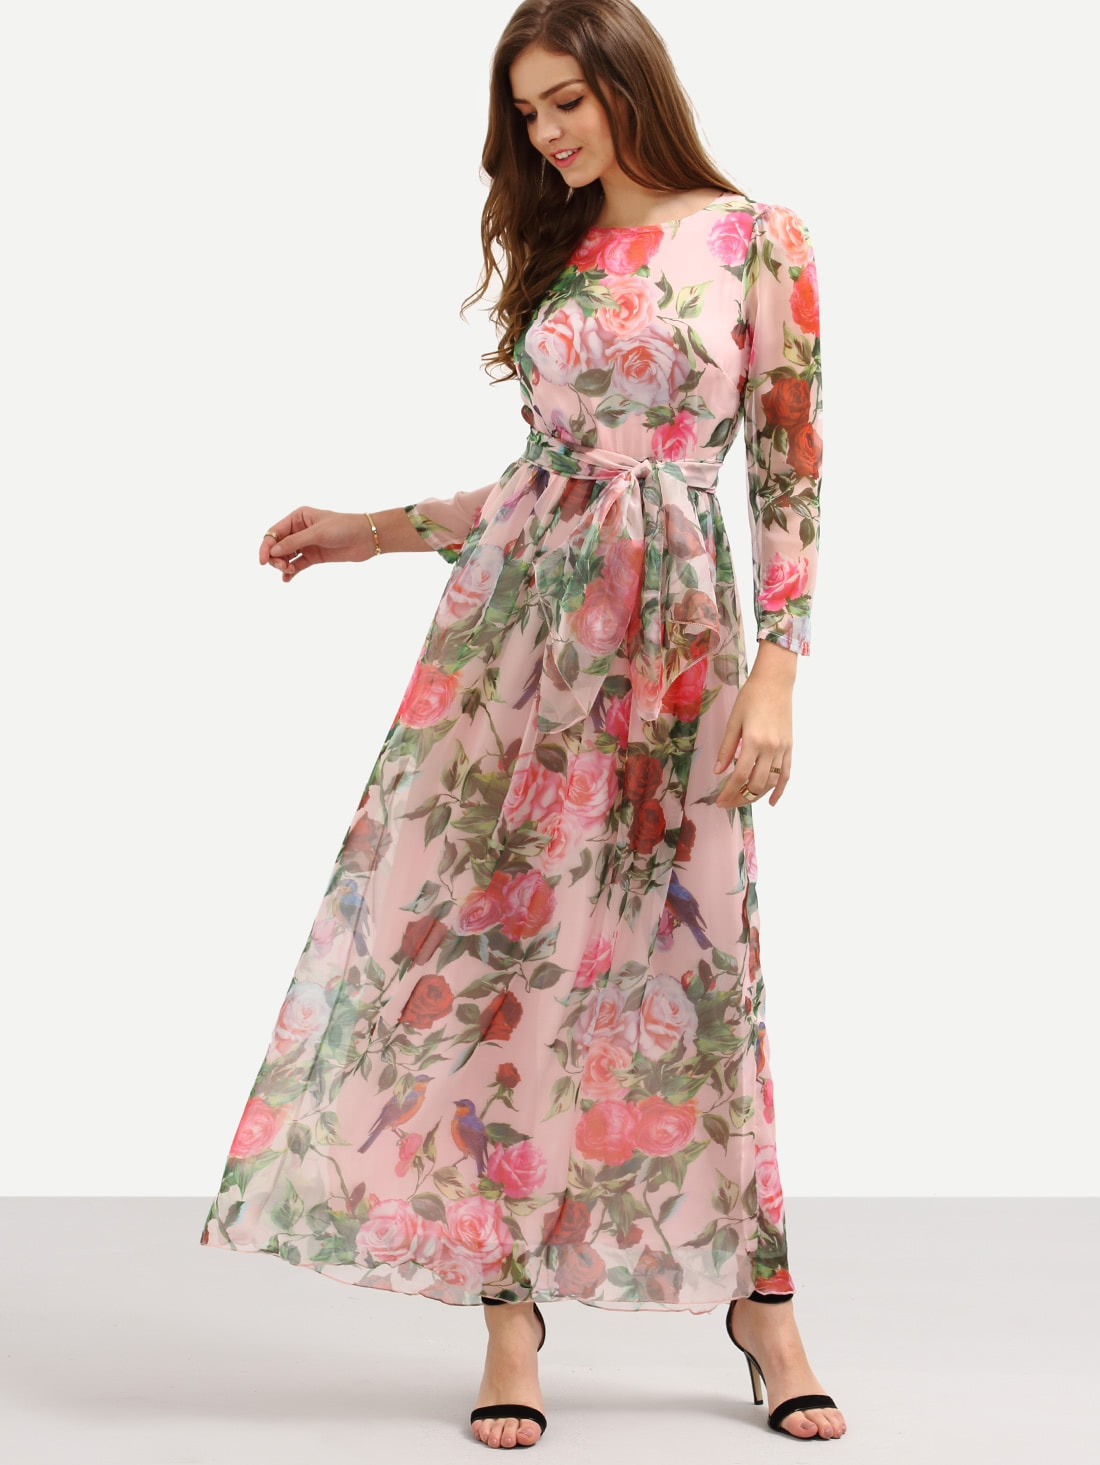 Self-Tie Rose Print Chiffon Romantic Dress new style romantic maxi chiffon long dress